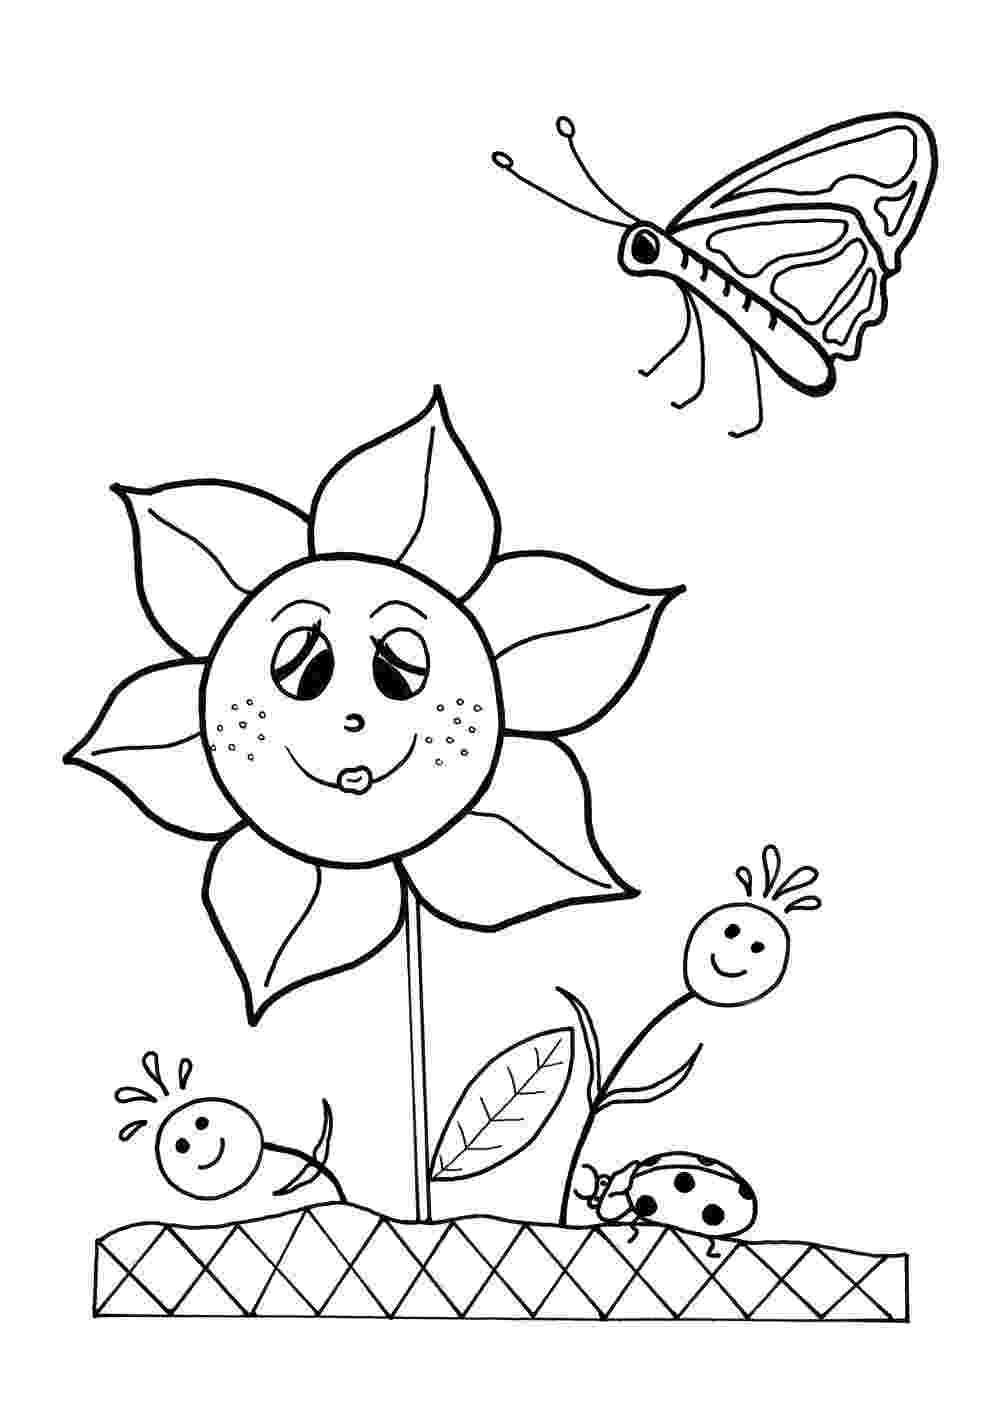 coloring pages for girls flowers 春天开的花朵简笔画 美丽的郁金香植物简笔画 5068儿童网 girls pages flowers coloring for